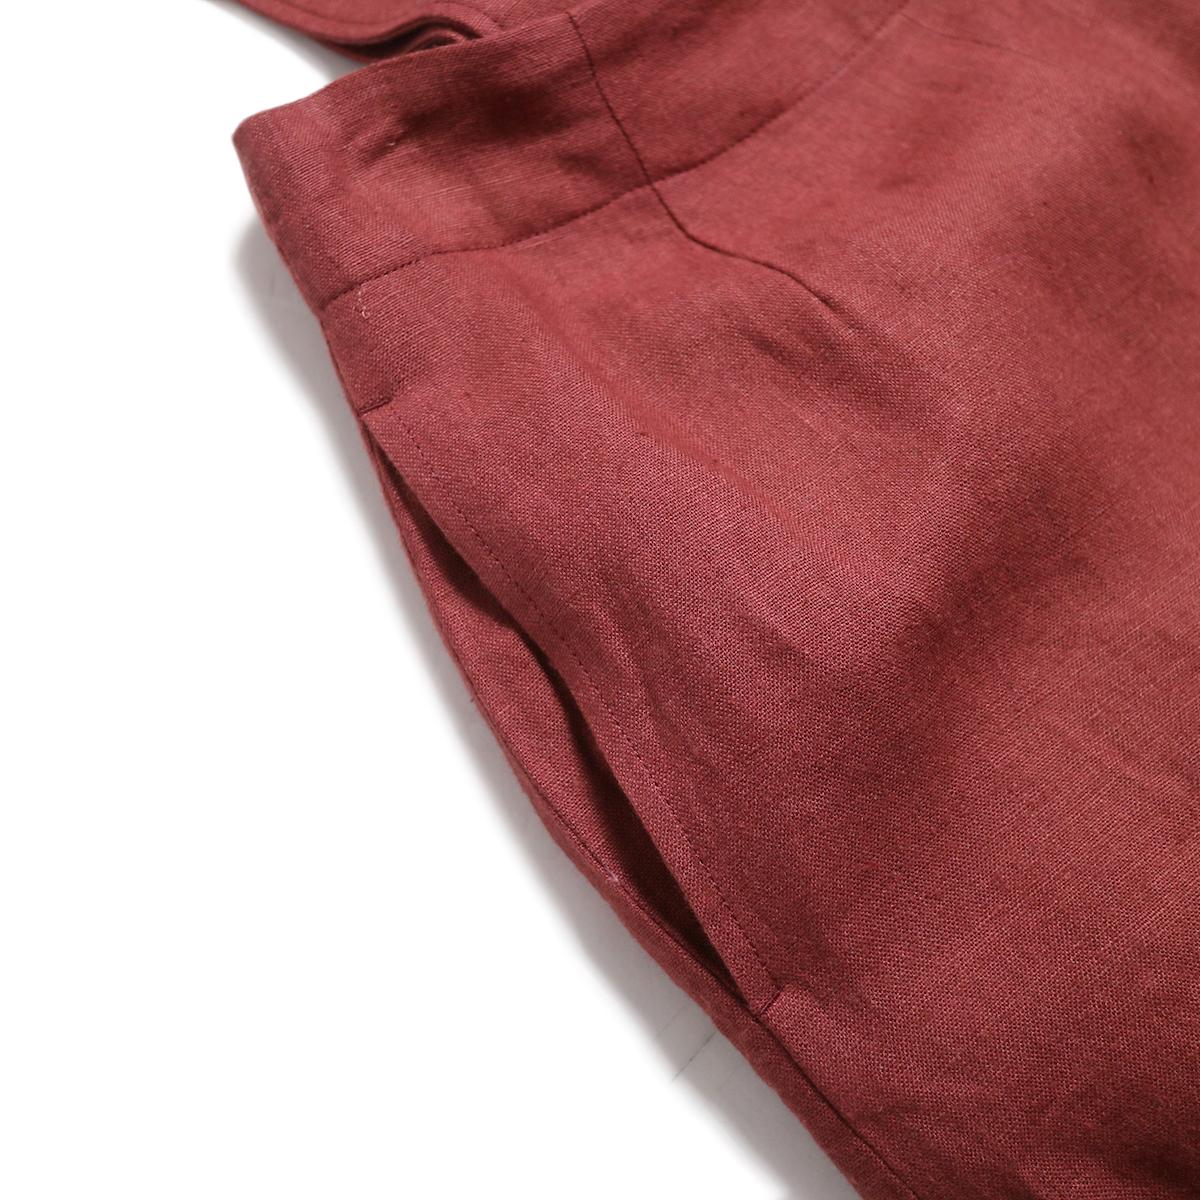 BLUEBIRD BOULEVARD / ウォッシュドリネンワイドパンツ -Burgundy ポケット